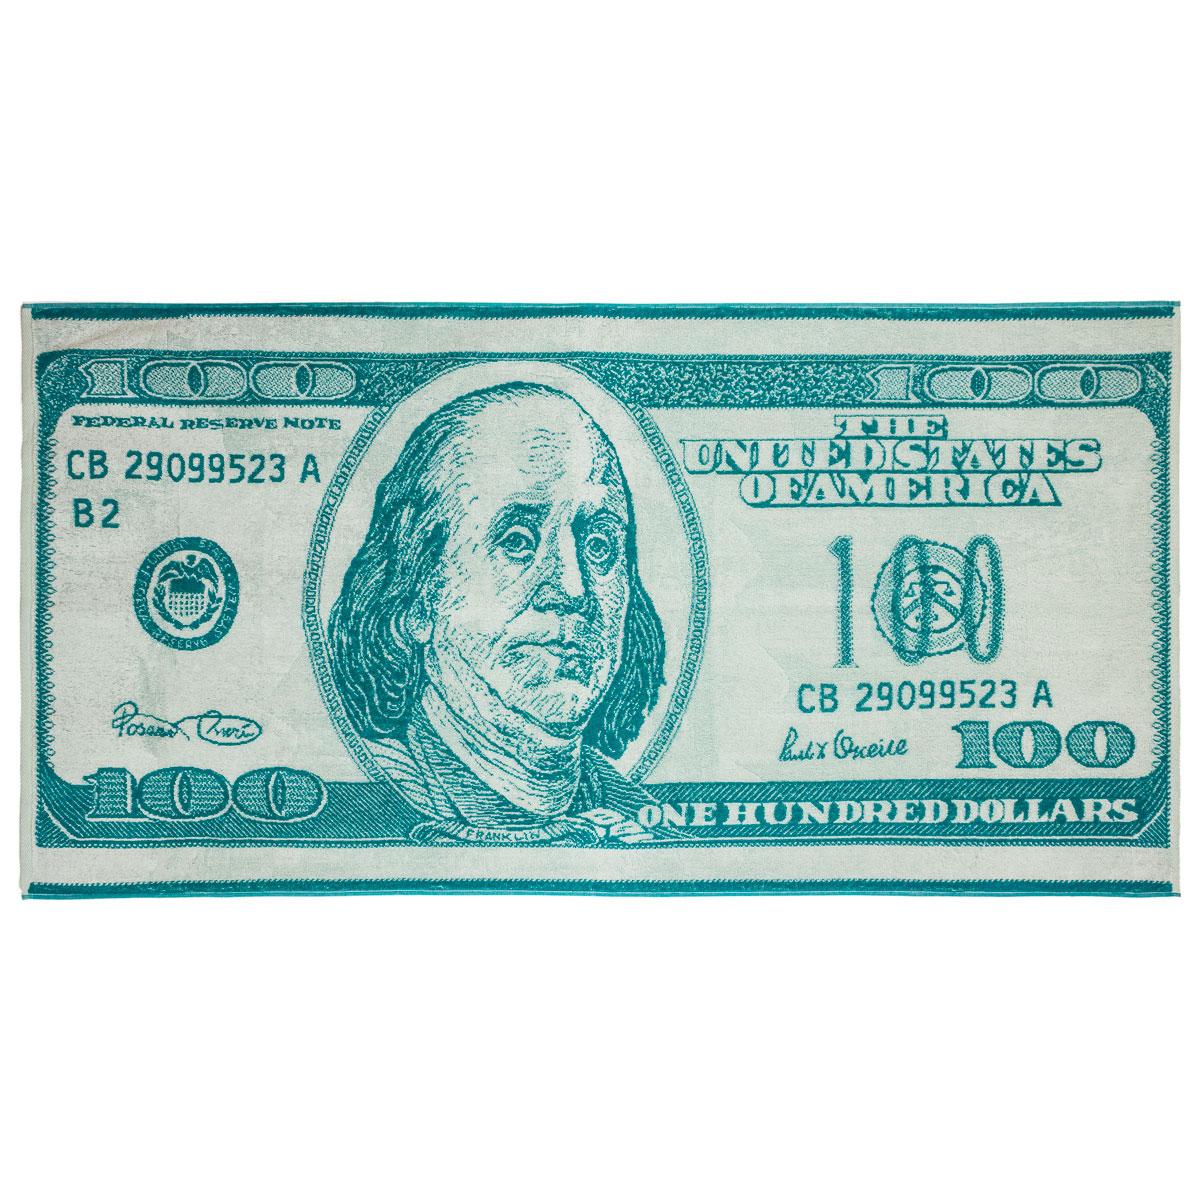 Полотенце Большое р. 70х140Махровые полотенца<br>Плотность ткани: 420 г/кв. м<br><br>Тип: Полотенце<br>Размер: 70х140<br>Материал: Махра